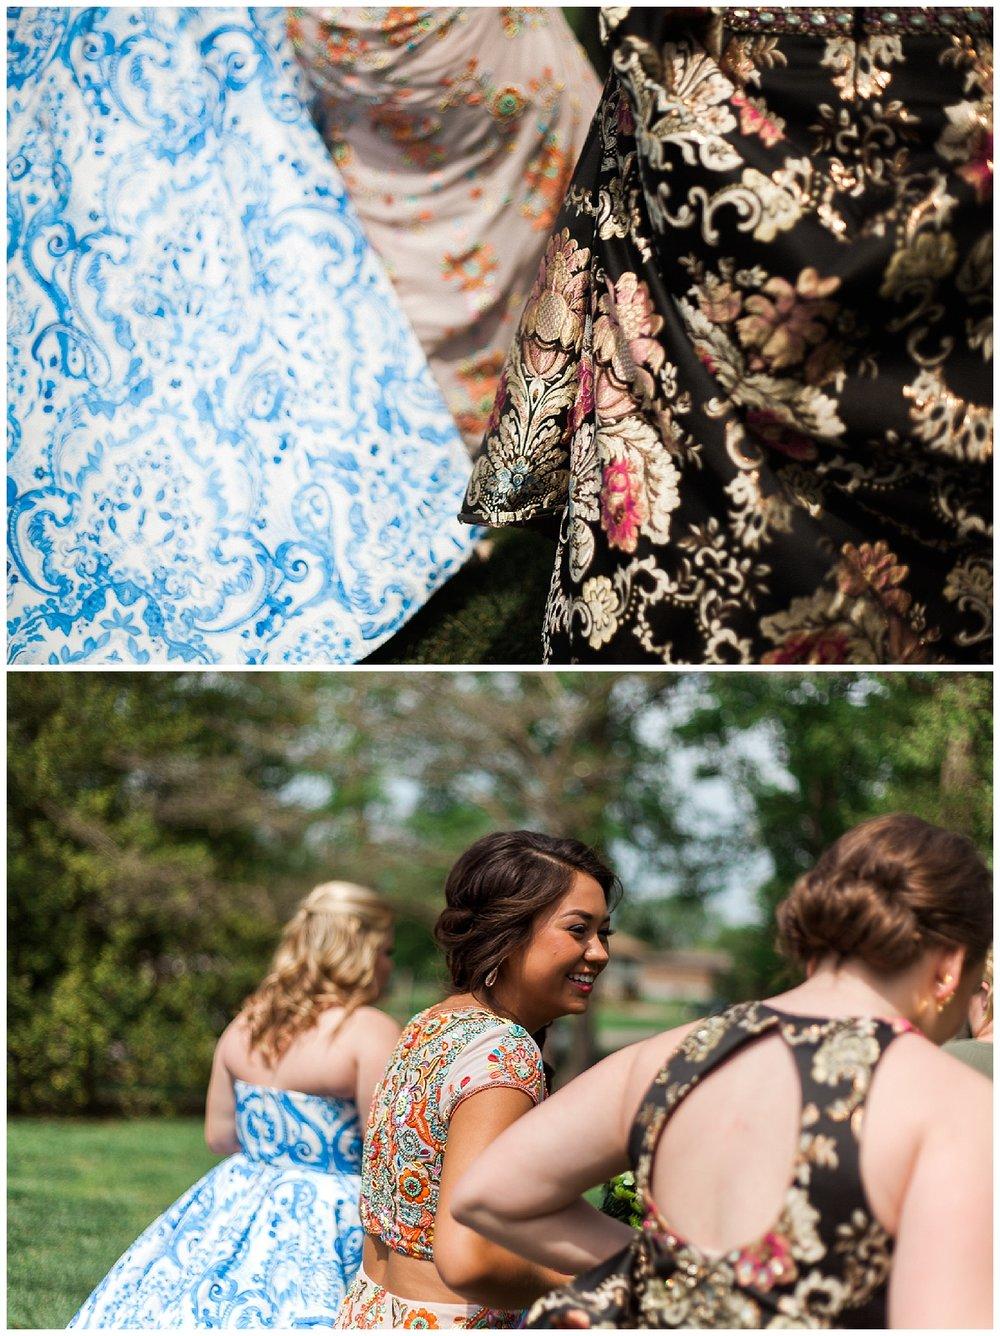 Kentucky-Photographer-Prom-Senior-Elizabethtown_0007.jpg